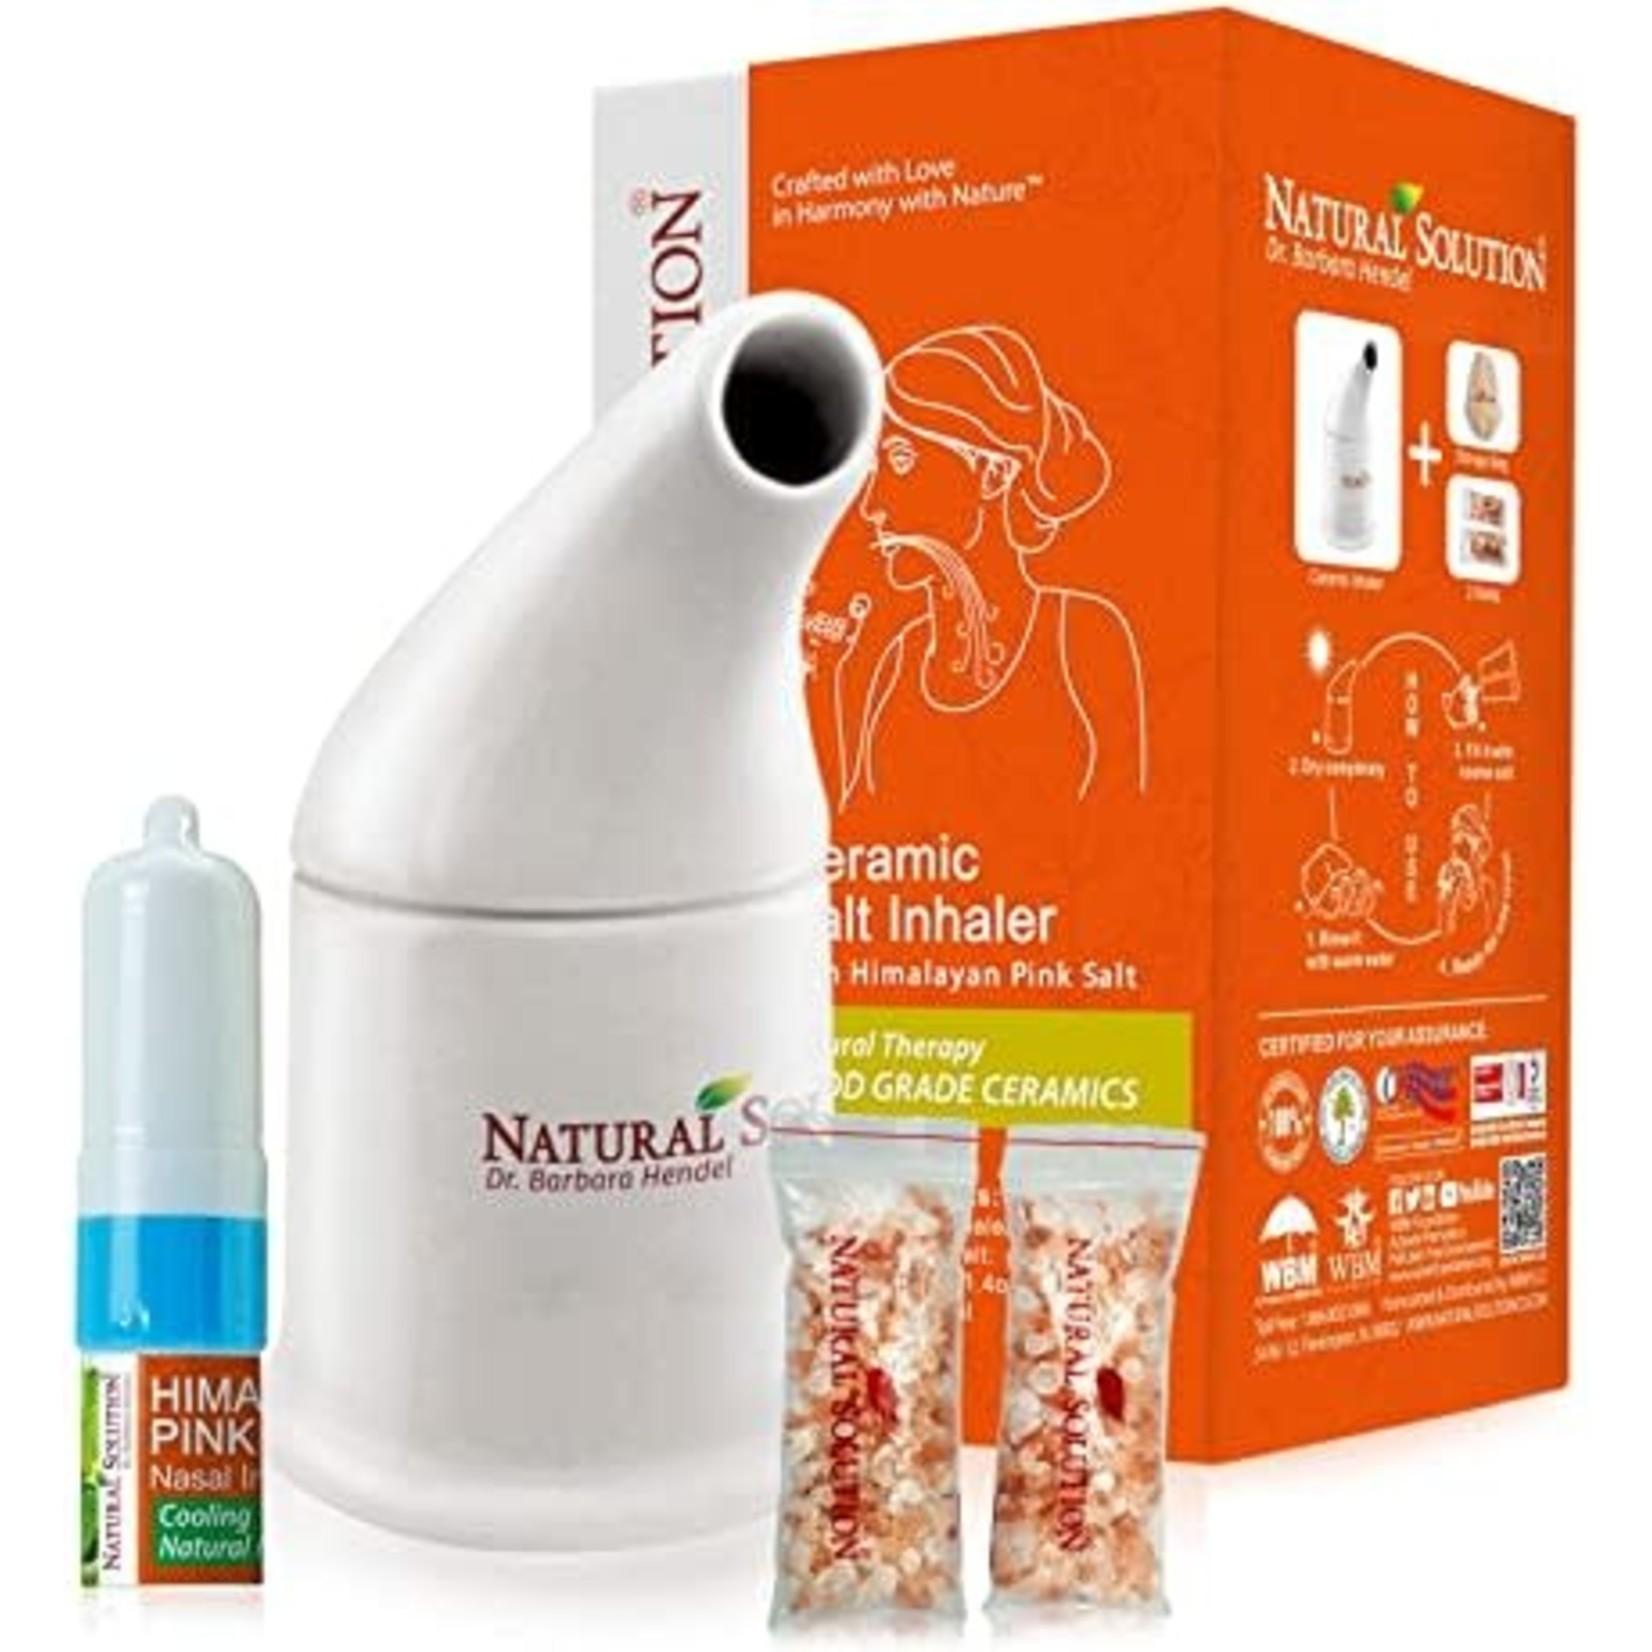 Ceramic Salt Inhaler